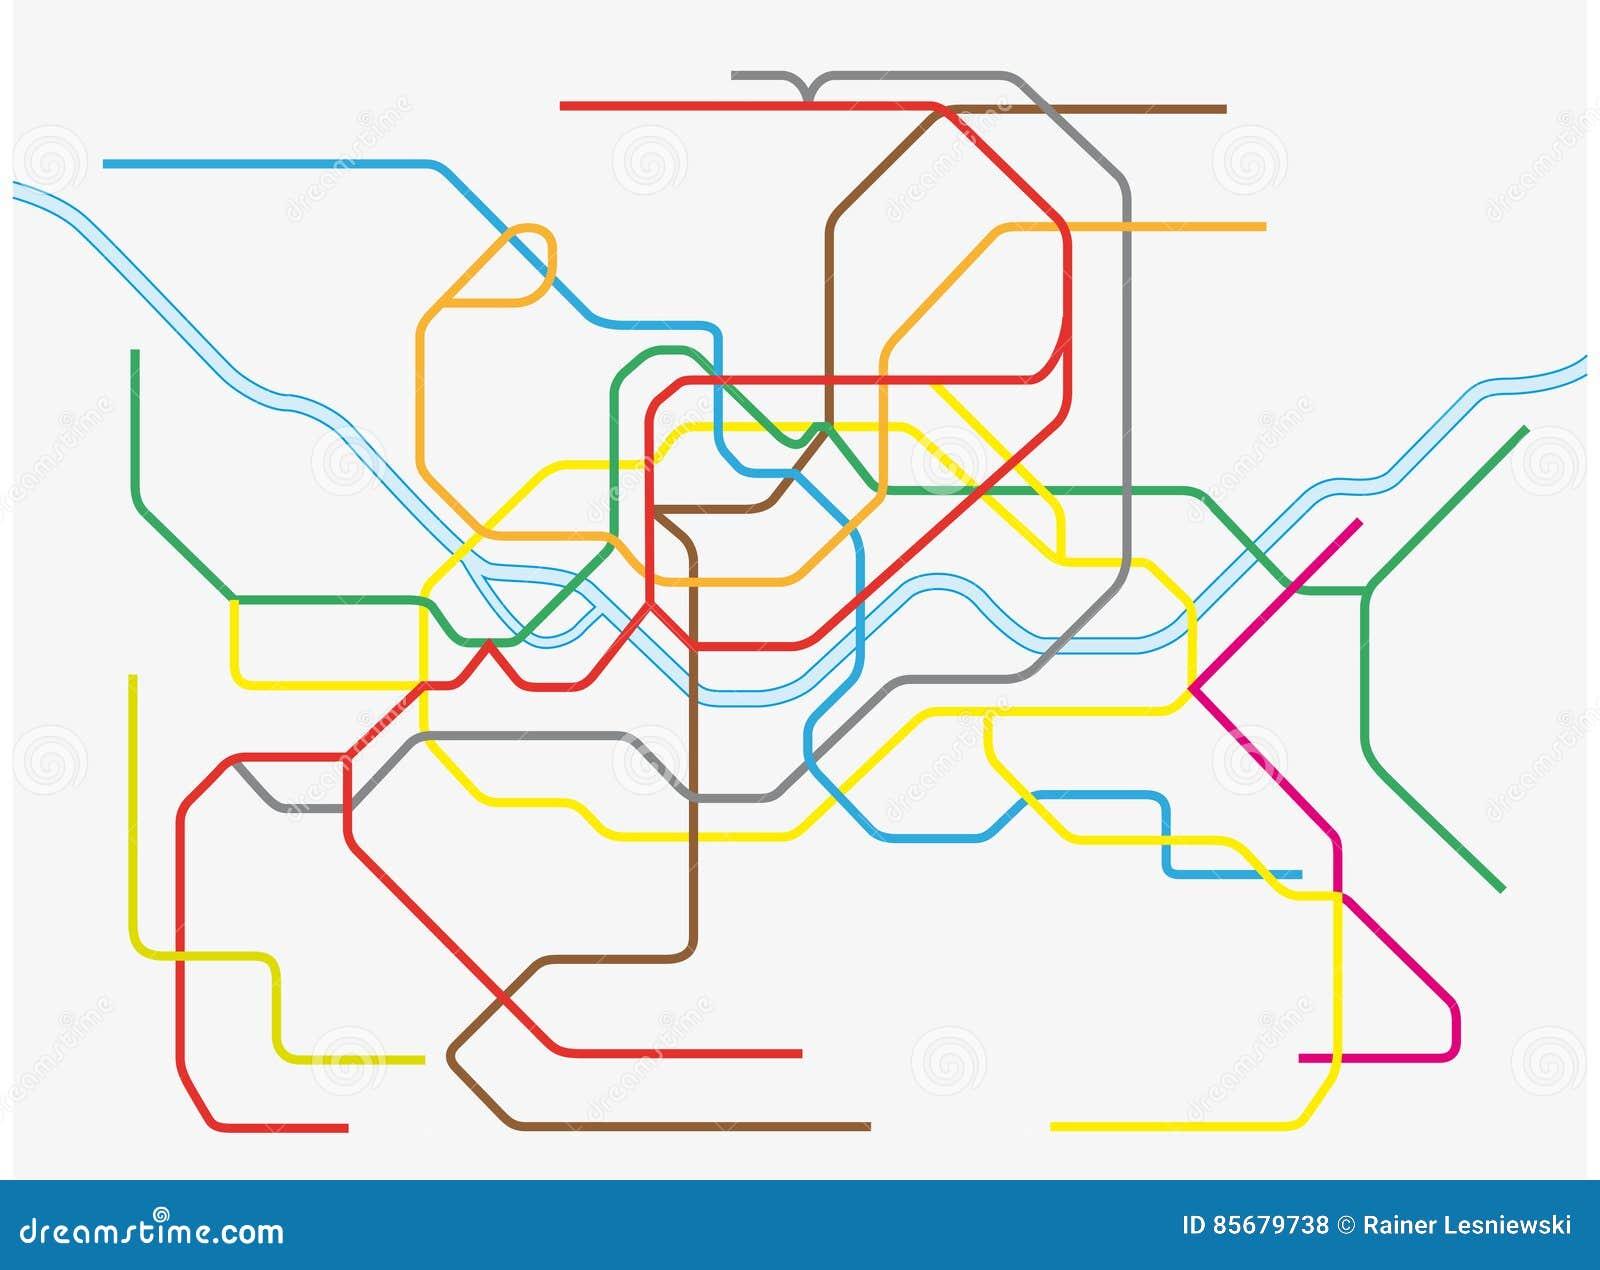 Seoul City Subway Map.Colorful Seoul Metropolitan Subway Map Stock Vector Illustration